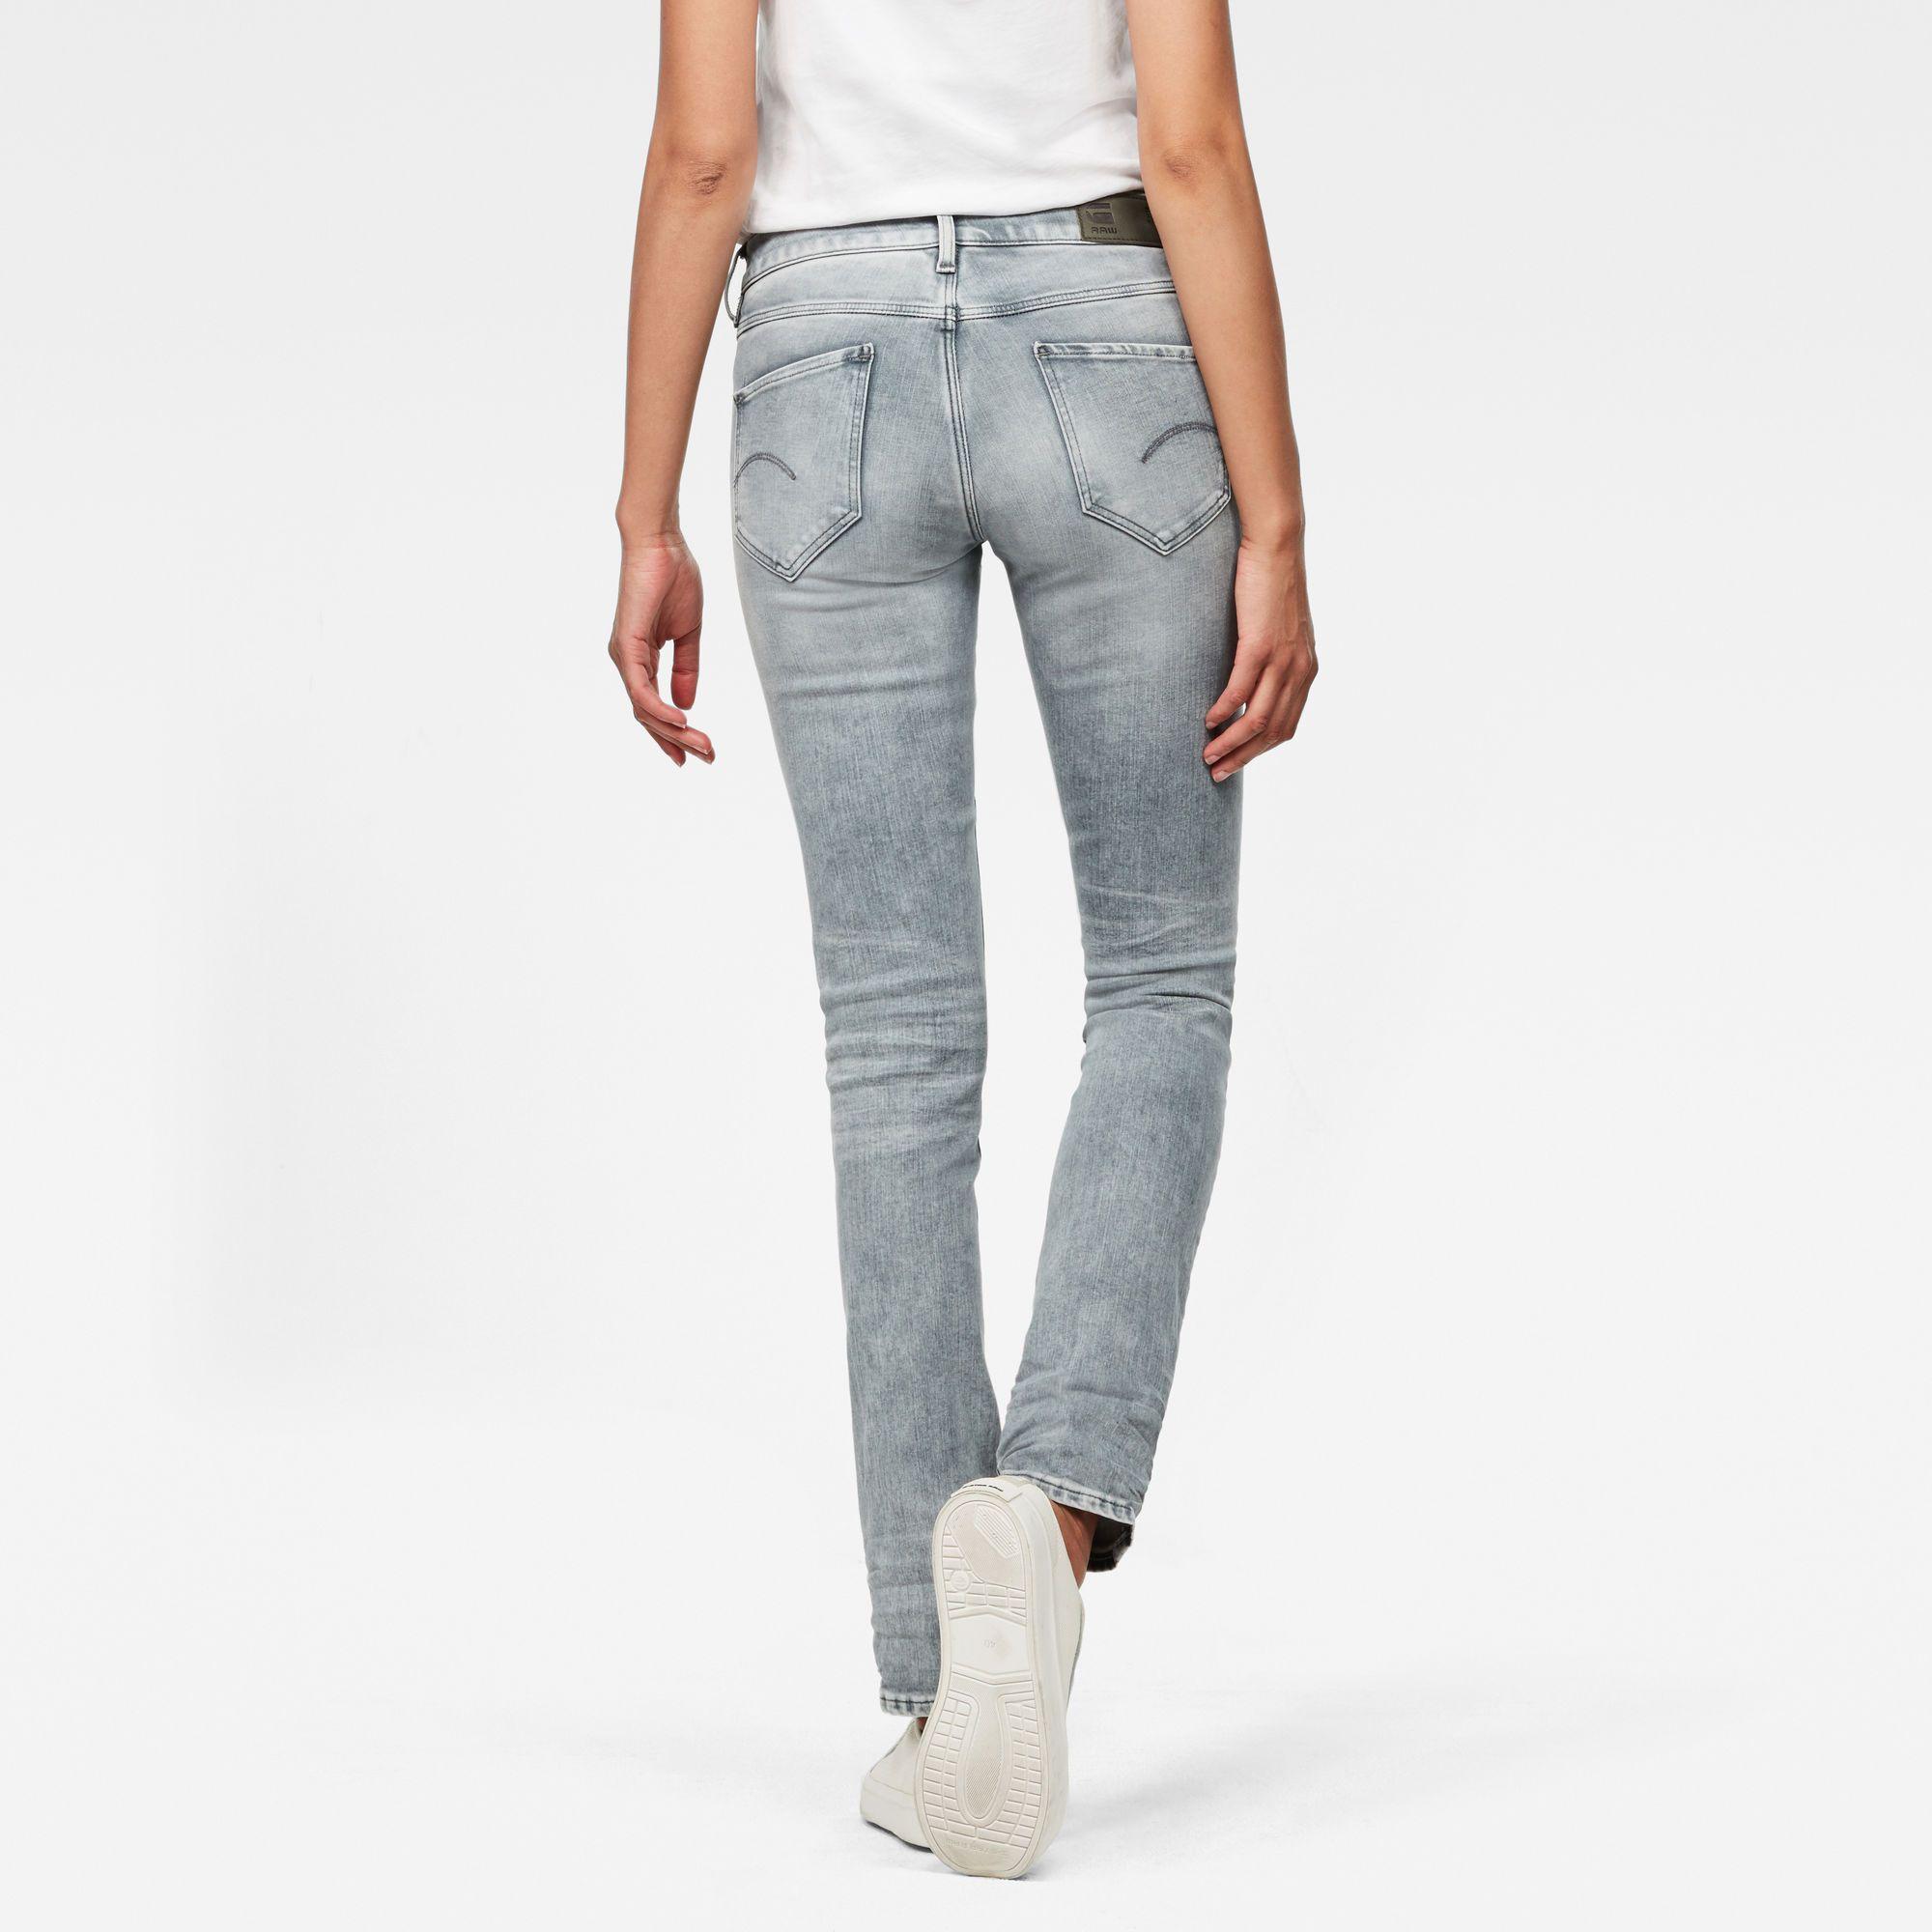 G-Star RAW Midge Mid Waist Straight Jeans